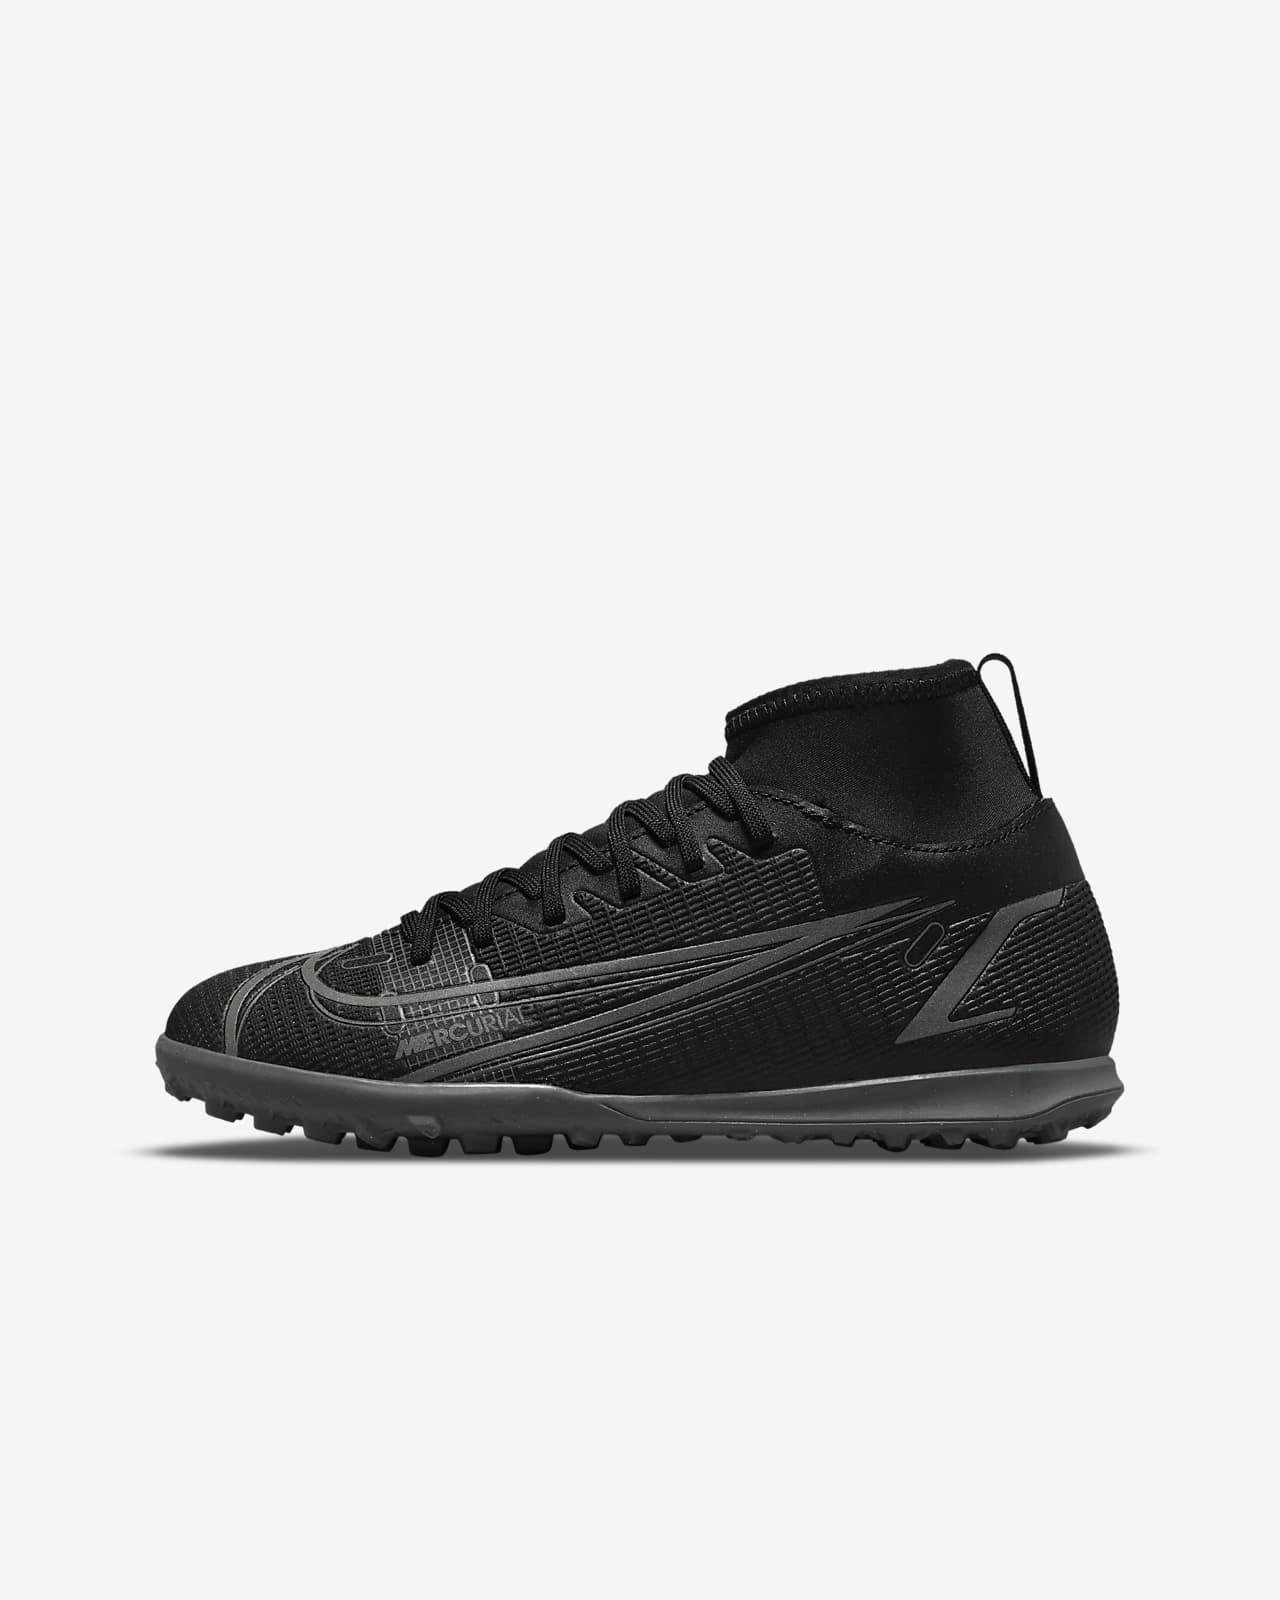 Nike Jr. Mercurial Superfly 8 Club TF Little/Big Kids' Artificial-Turf Soccer Shoe